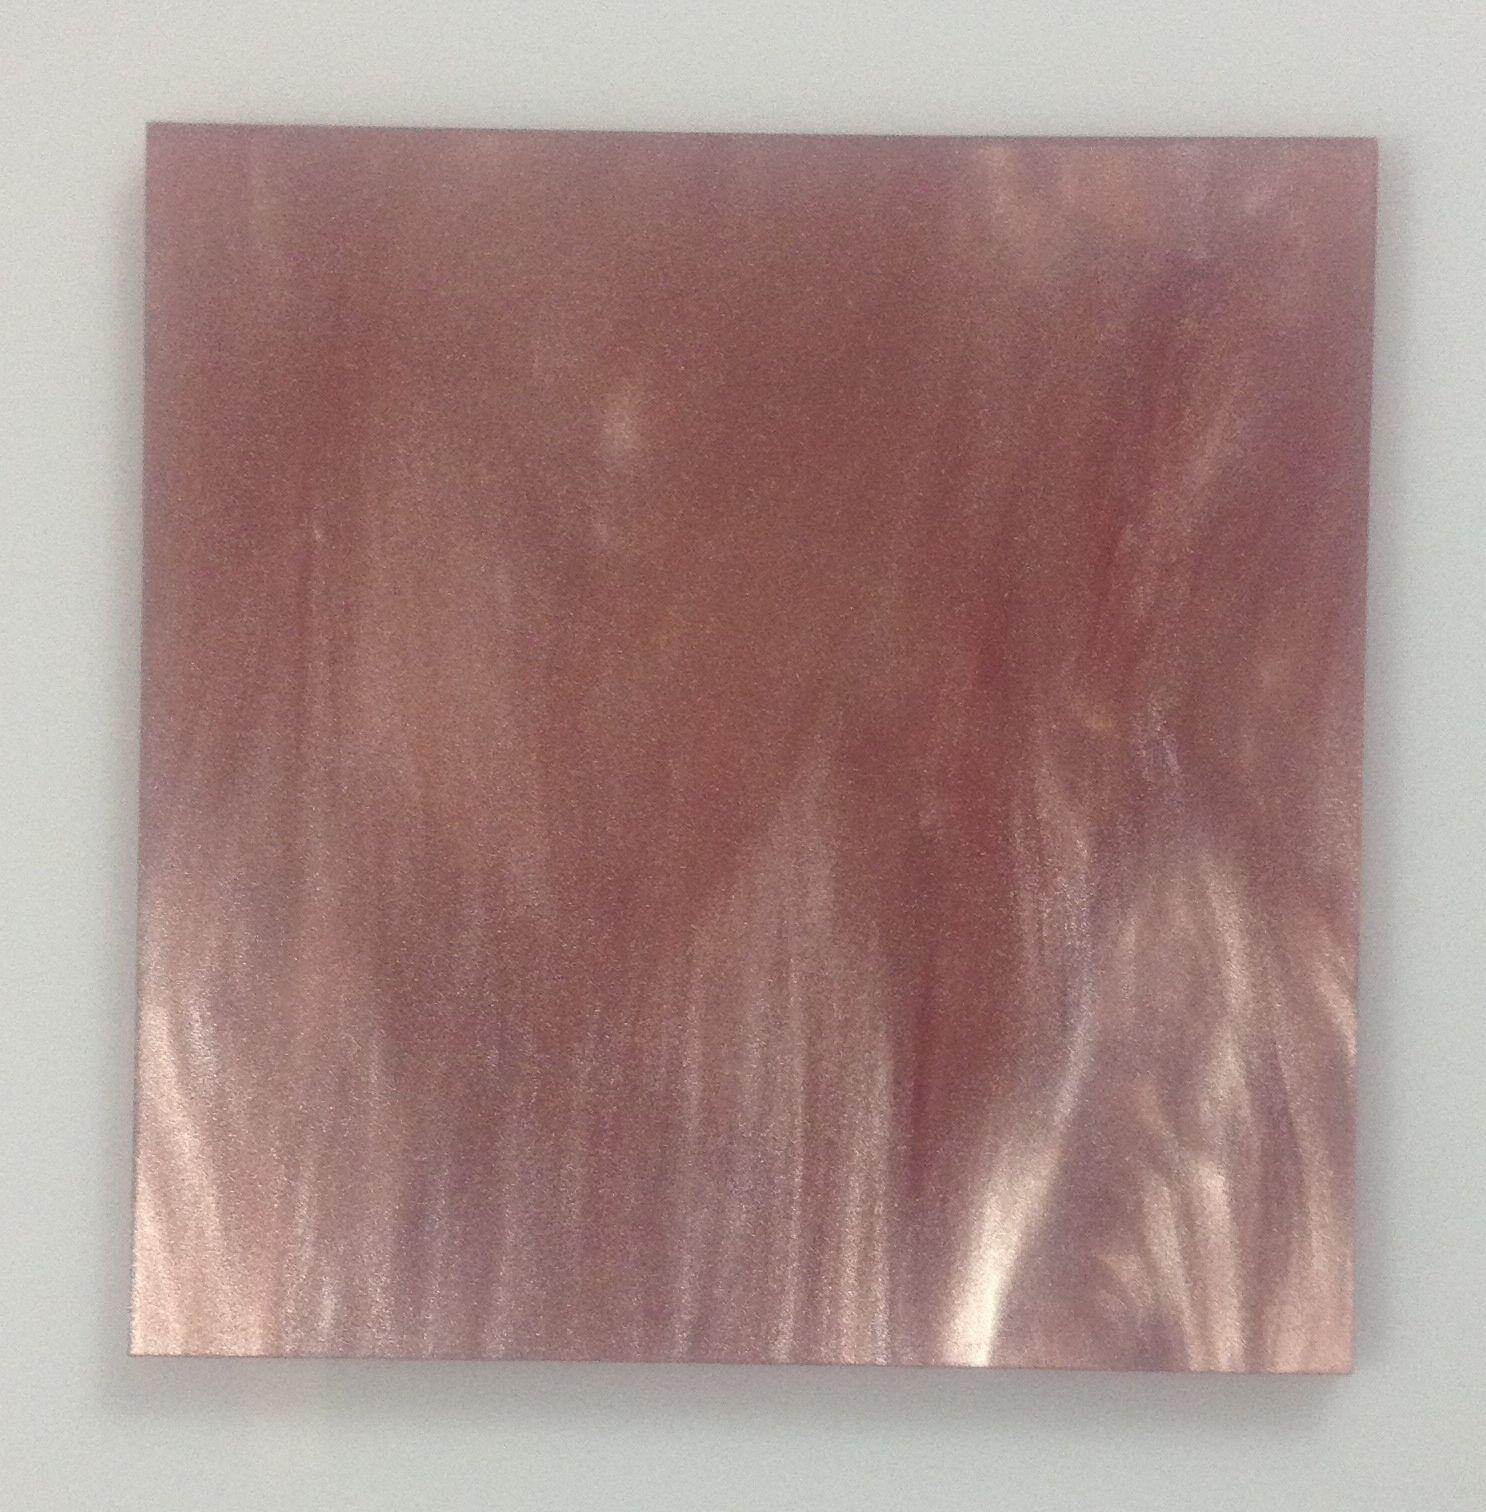 Pink Pearl Acrylic Sheet 1 8 Inch Acrylic Sheets Acrylic Colors Pearls